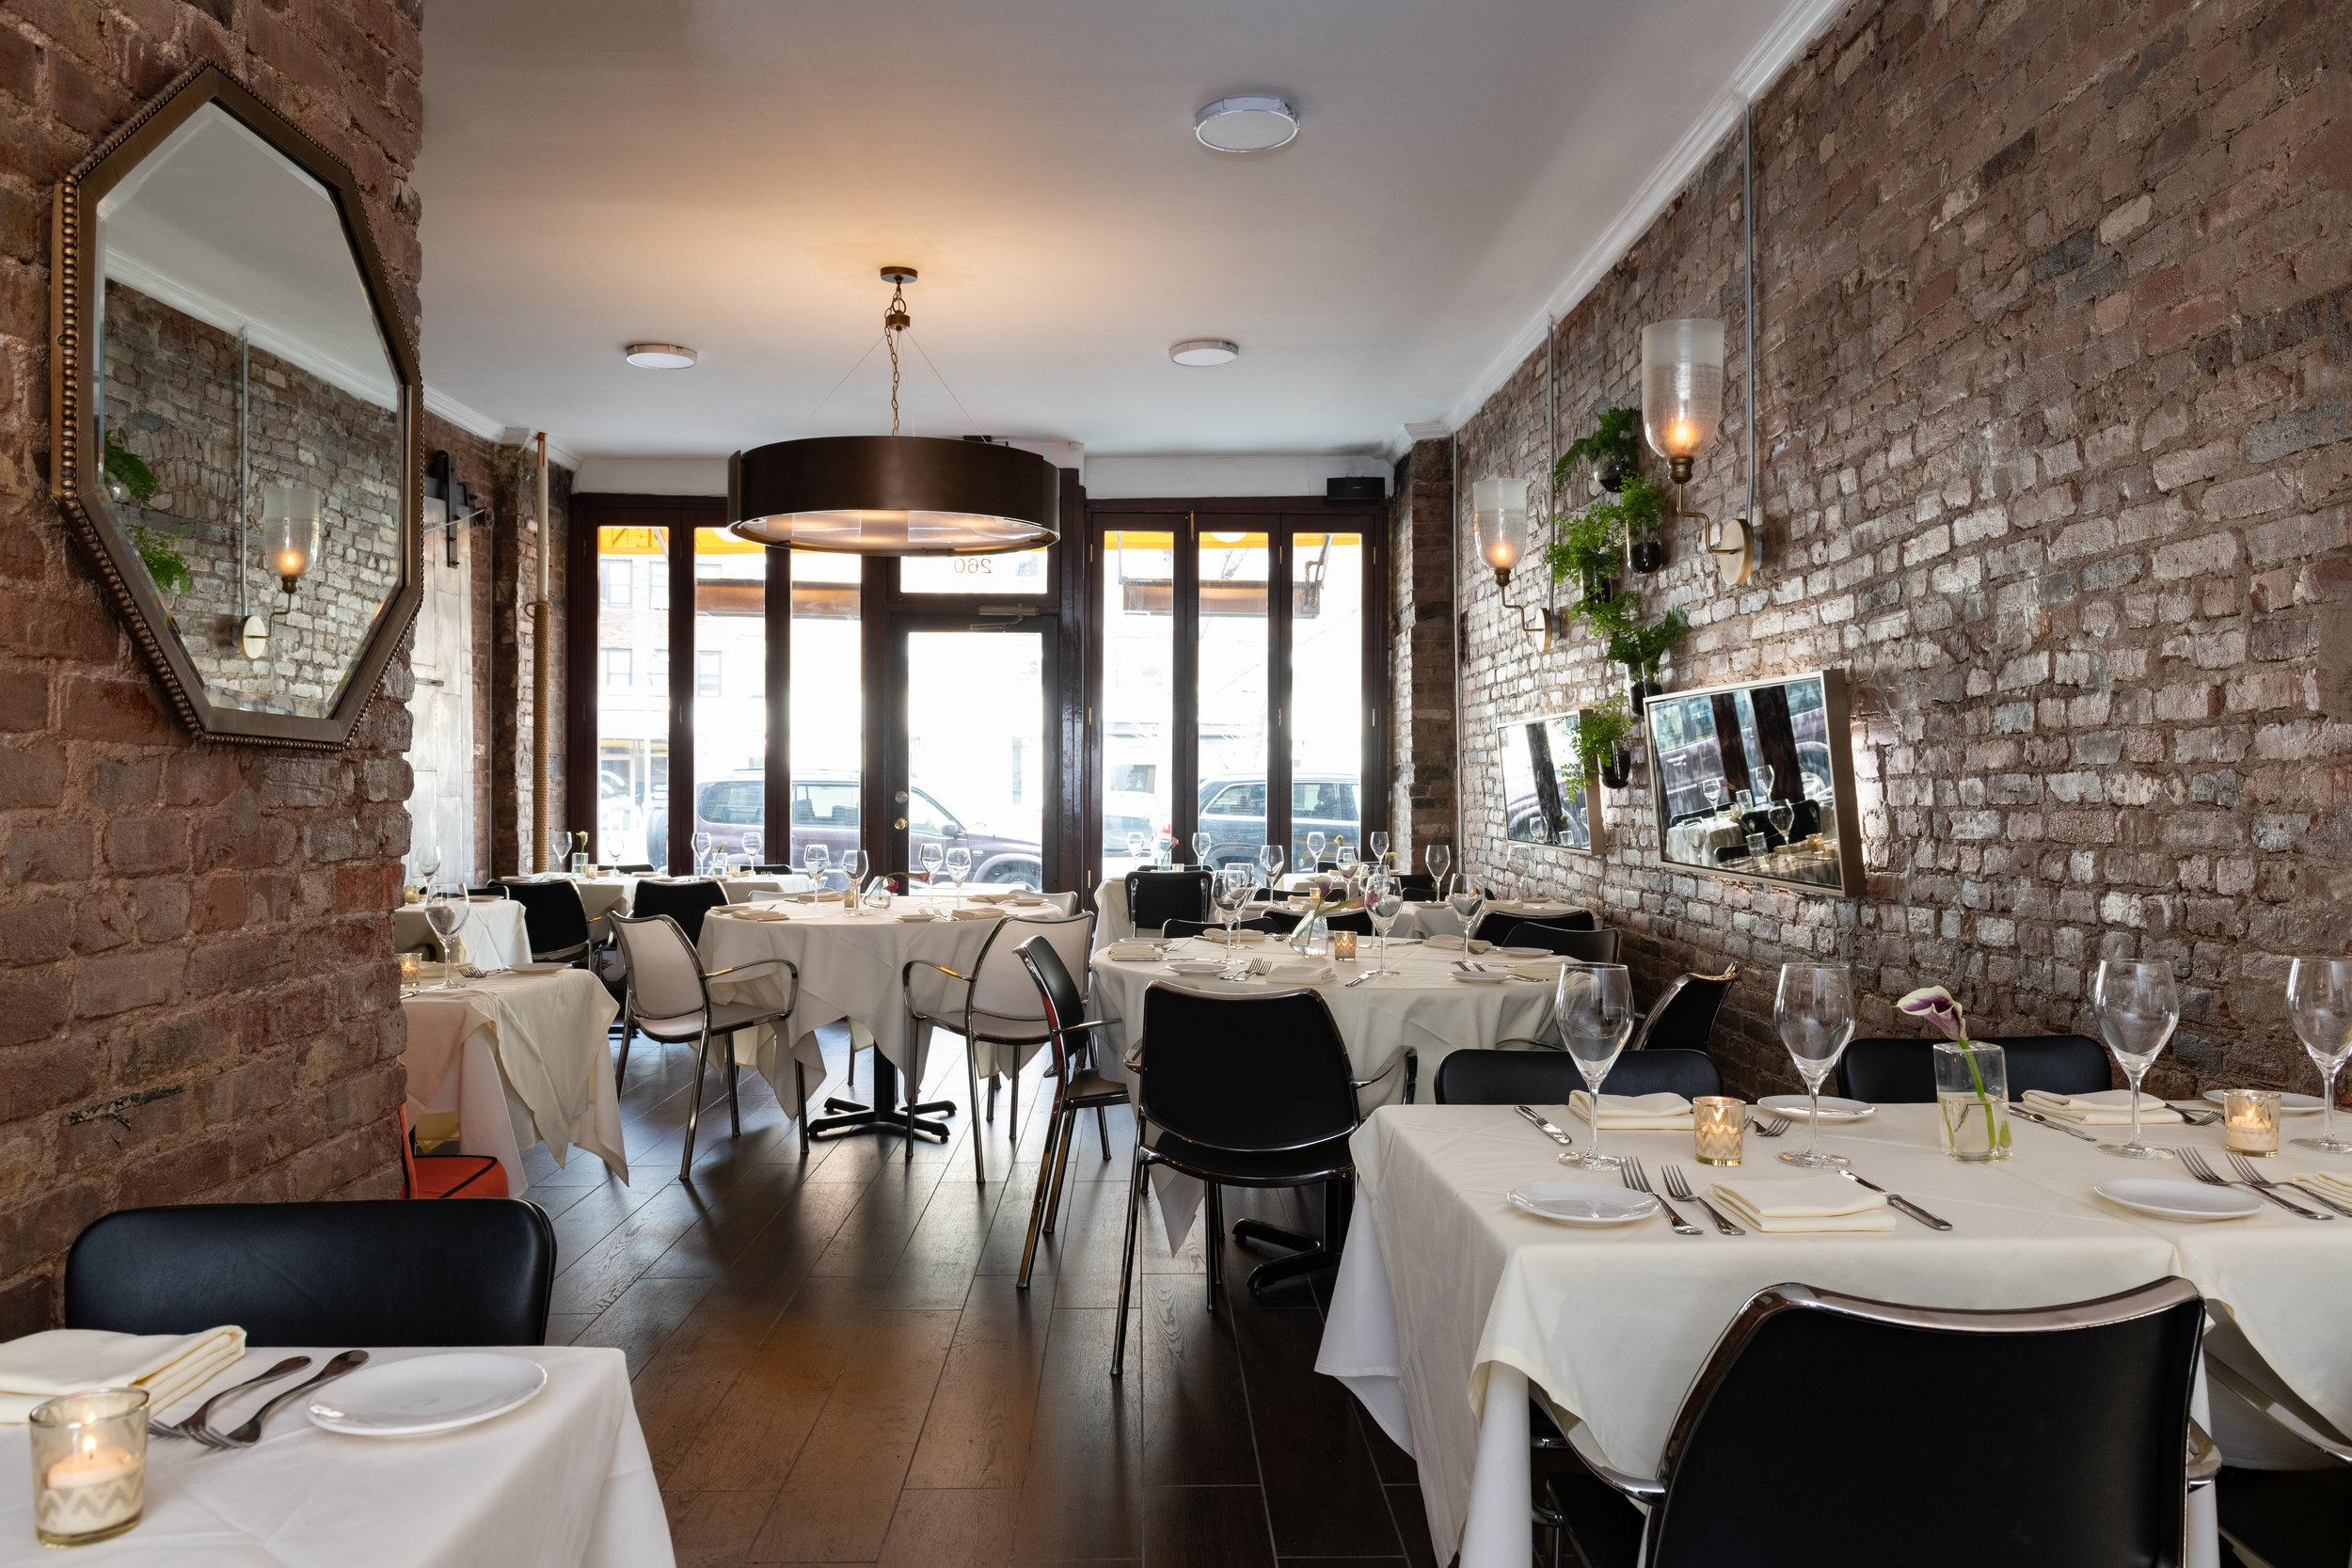 Restaurant photographer, Avena Downtown, Interior photographer, Italian Cuisine, Boston Food Photographer, New York City food photographer, CT Food Photographer, Commerical Food Photographer, Cookbook photographer, Morgan Ione Photography